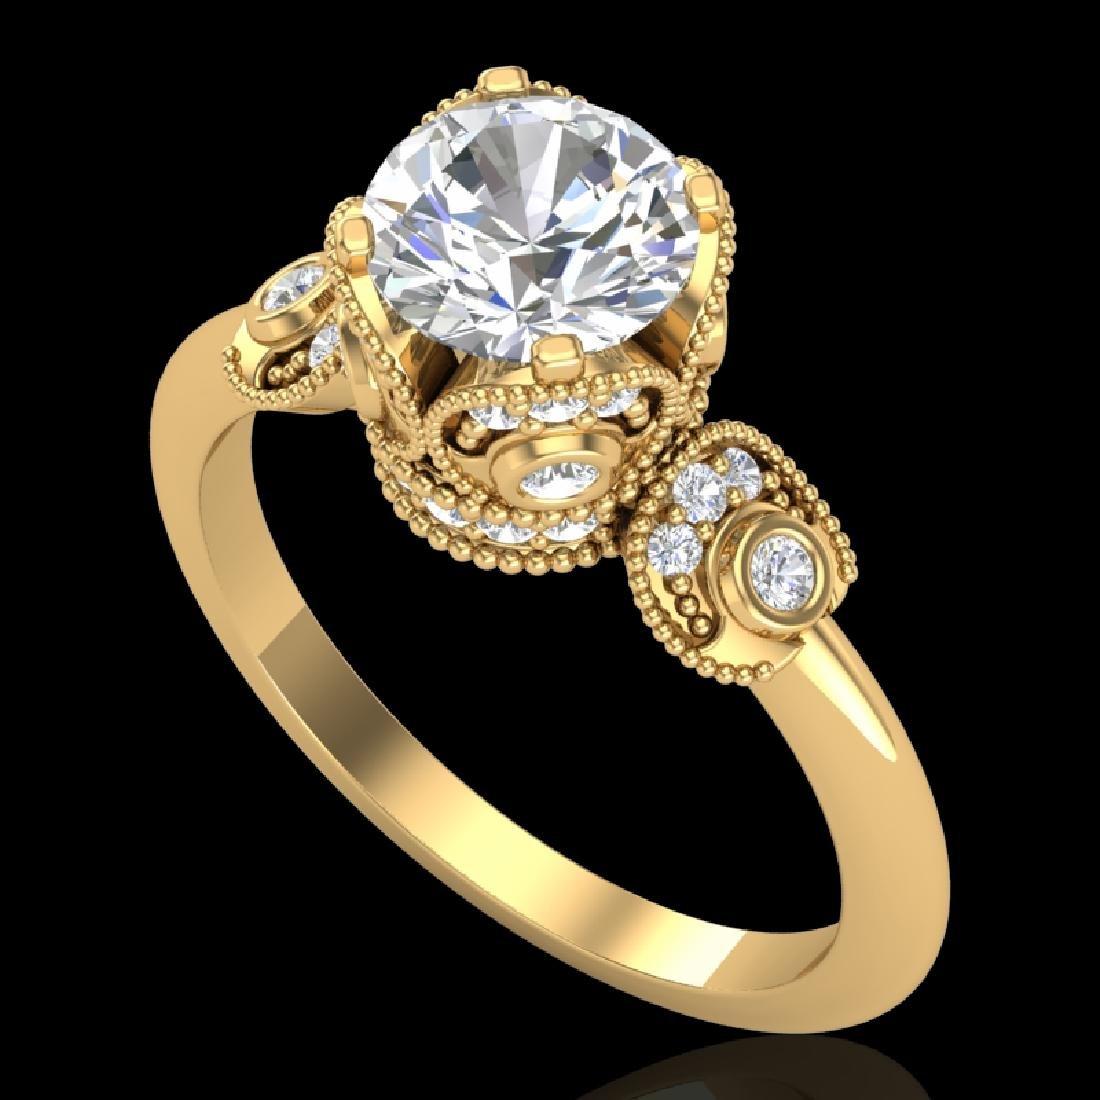 1.75 CTW VS/SI Diamond Art Deco Ring 18K Yellow Gold